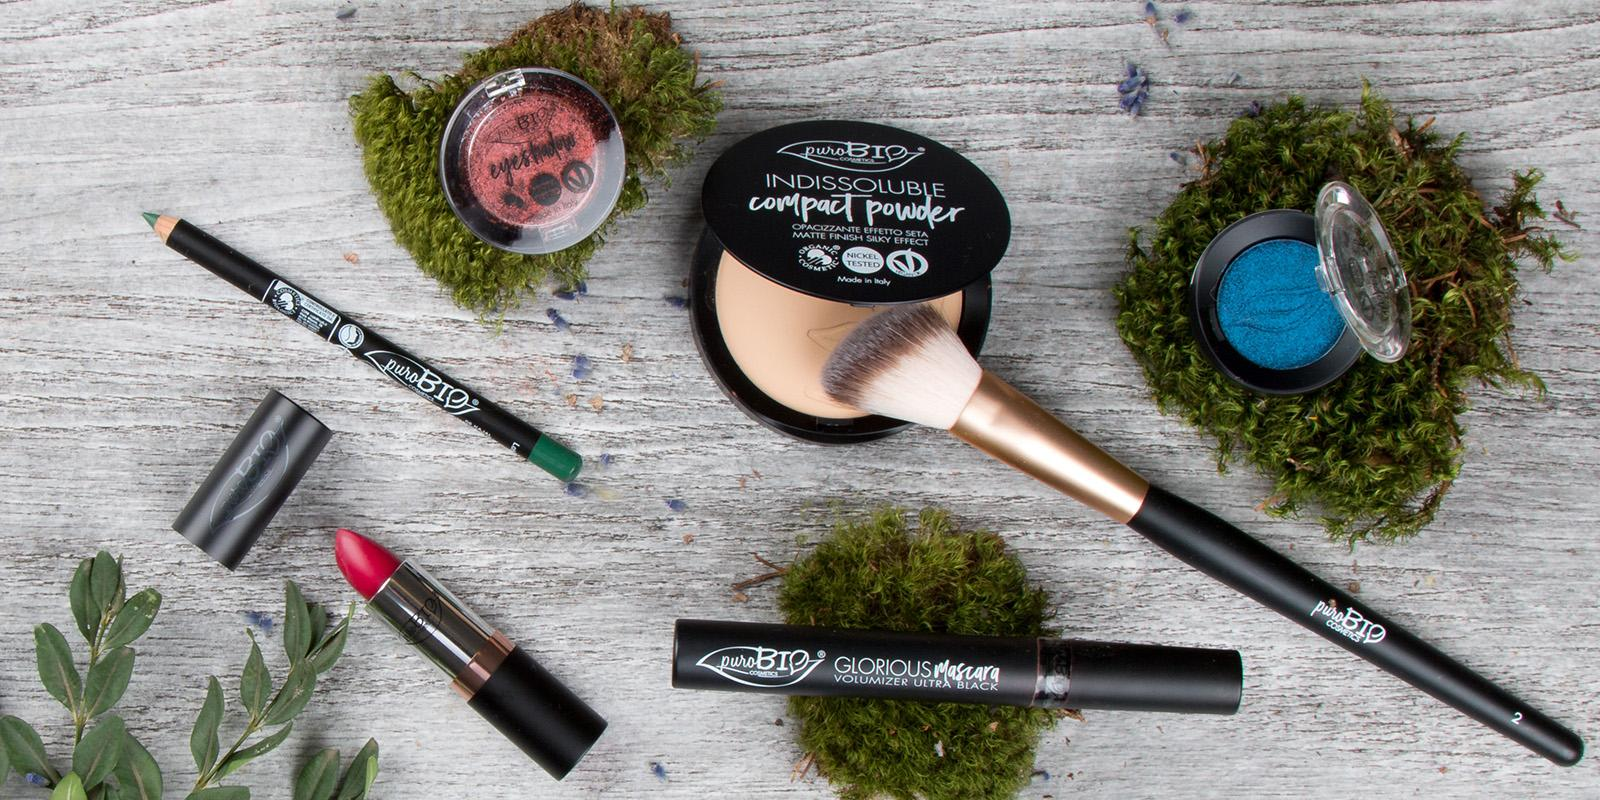 Makeup čistý a bio? PuroBIO!